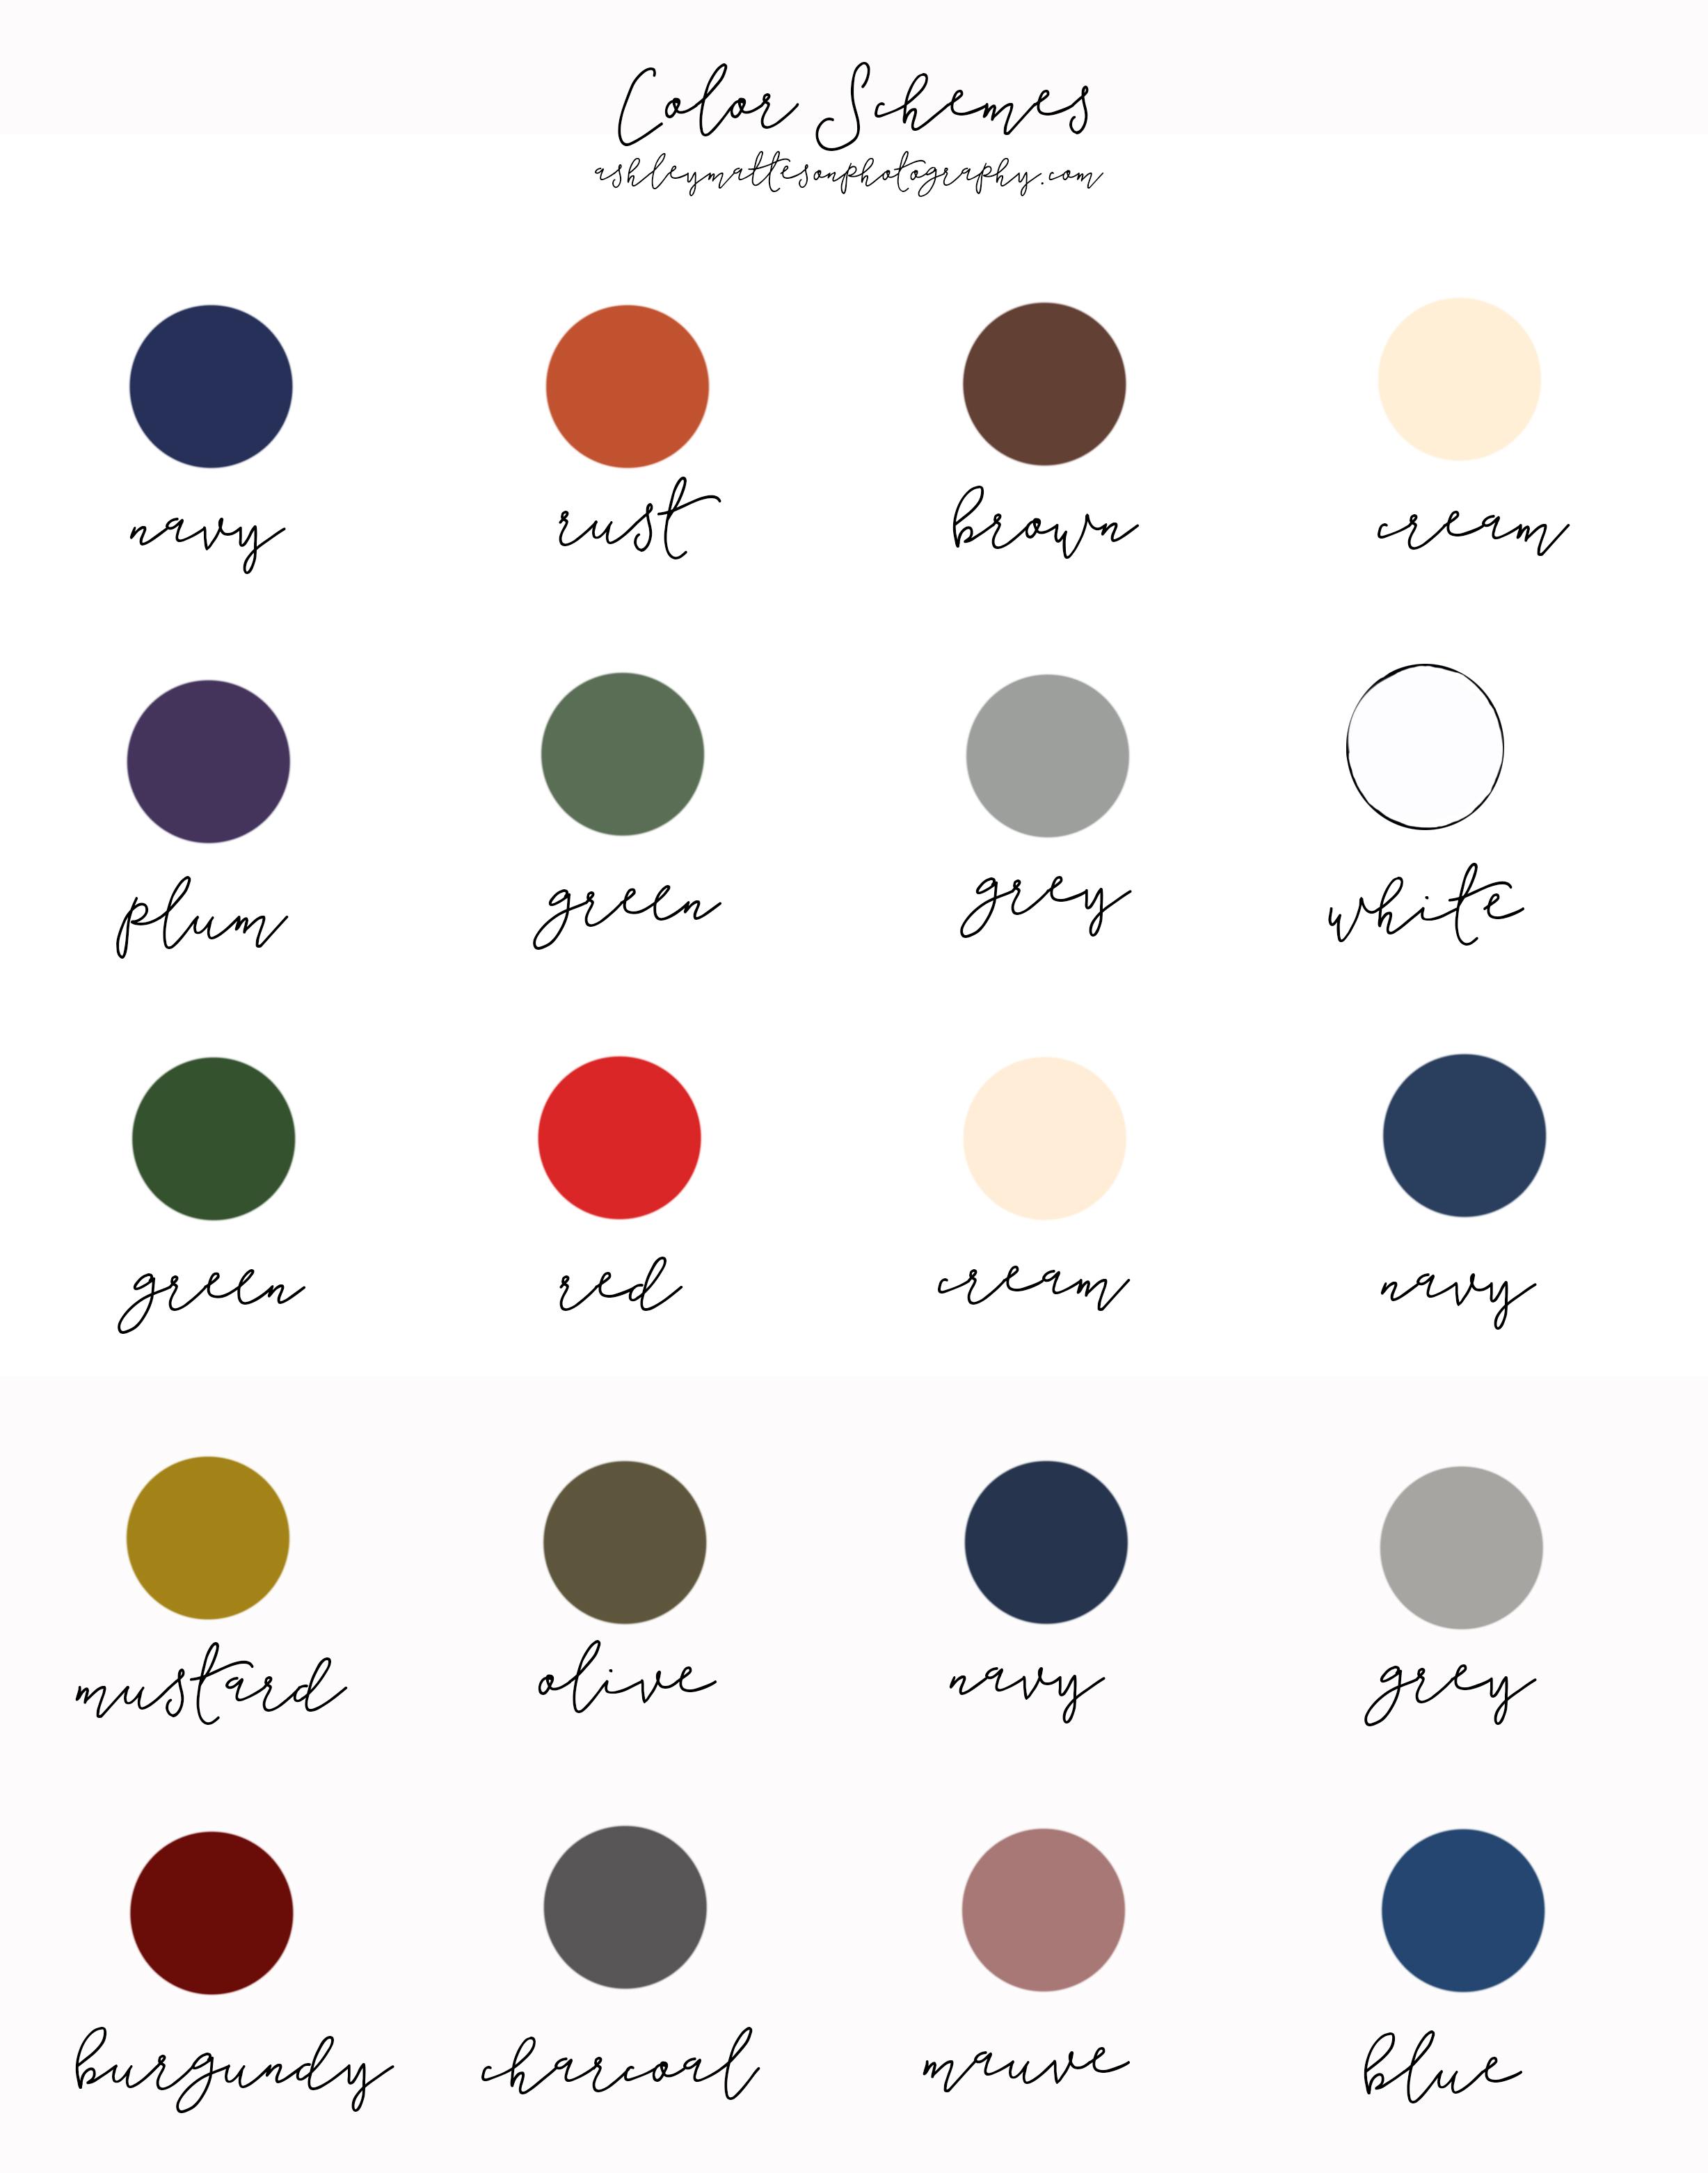 colorschemes.jpg